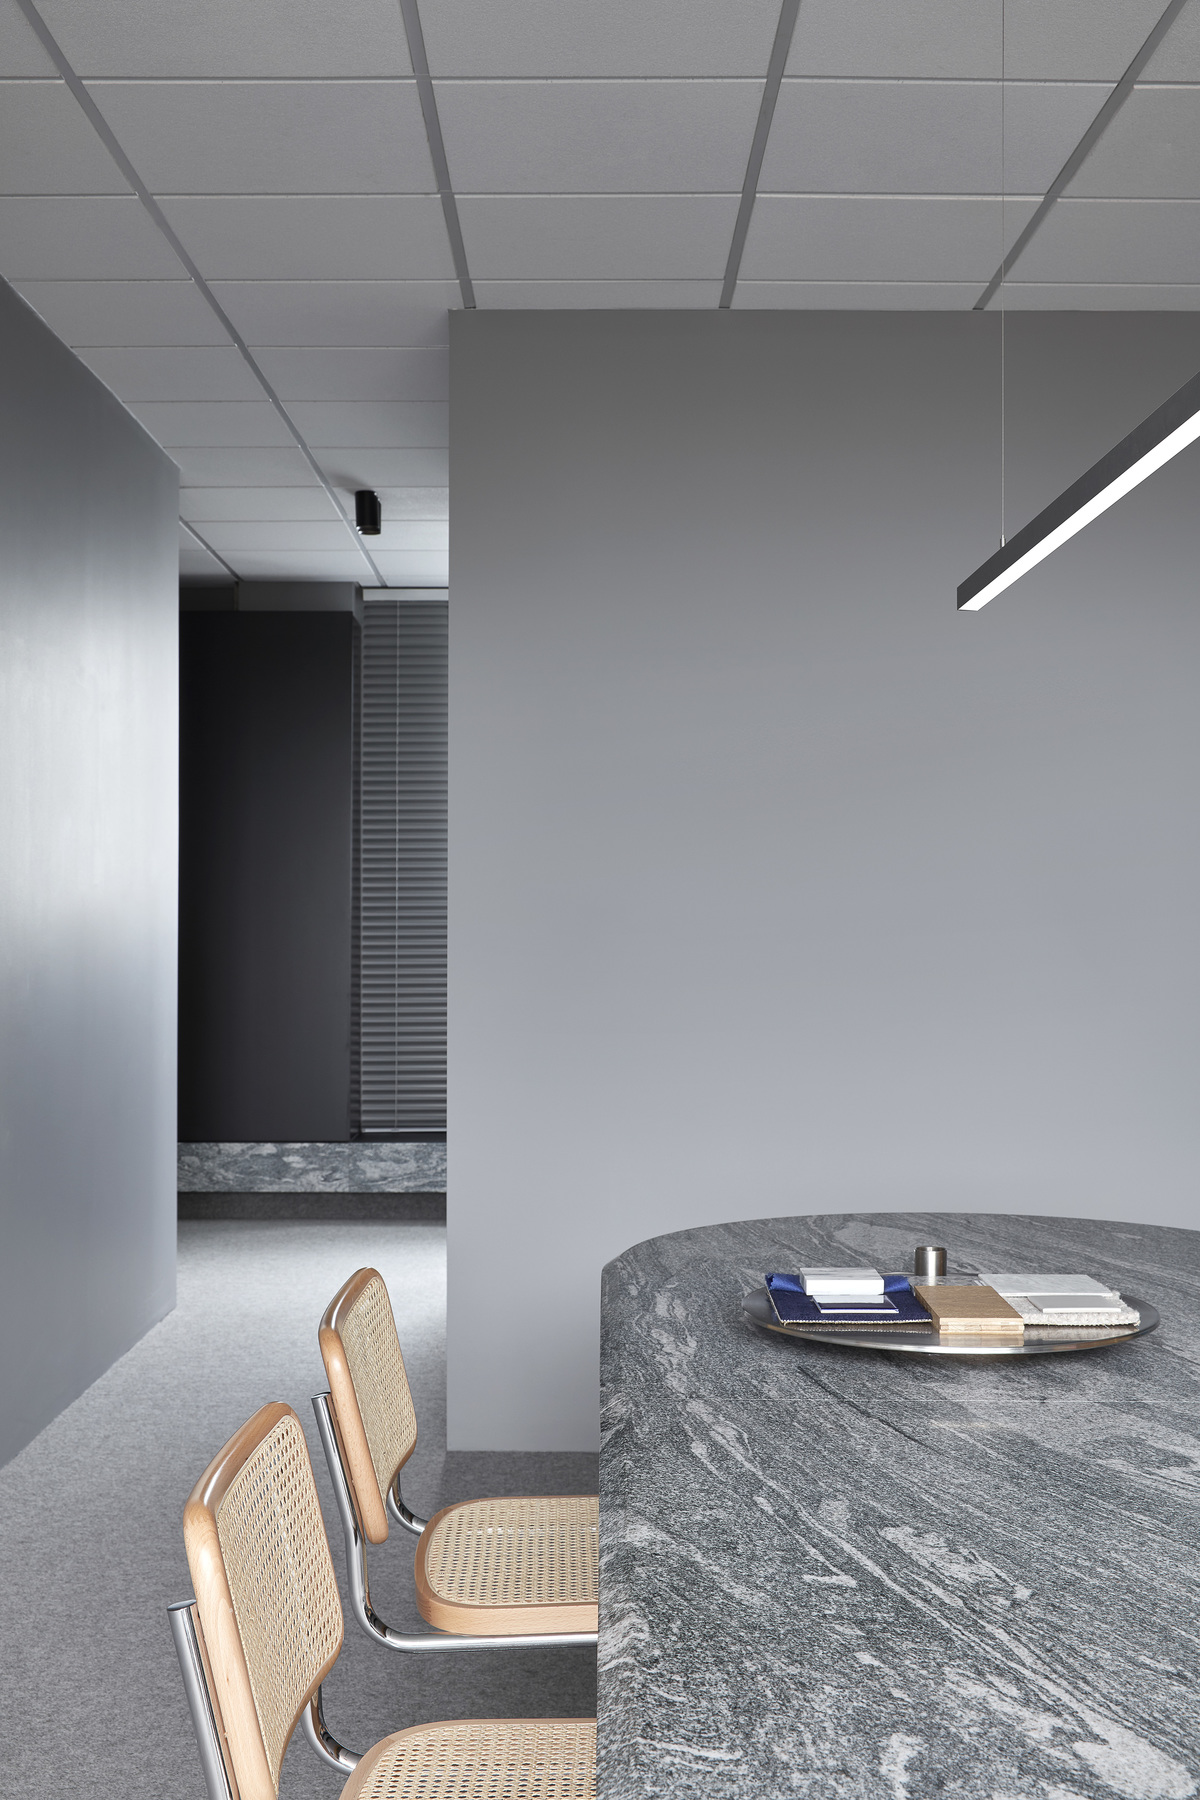 Main meeting table